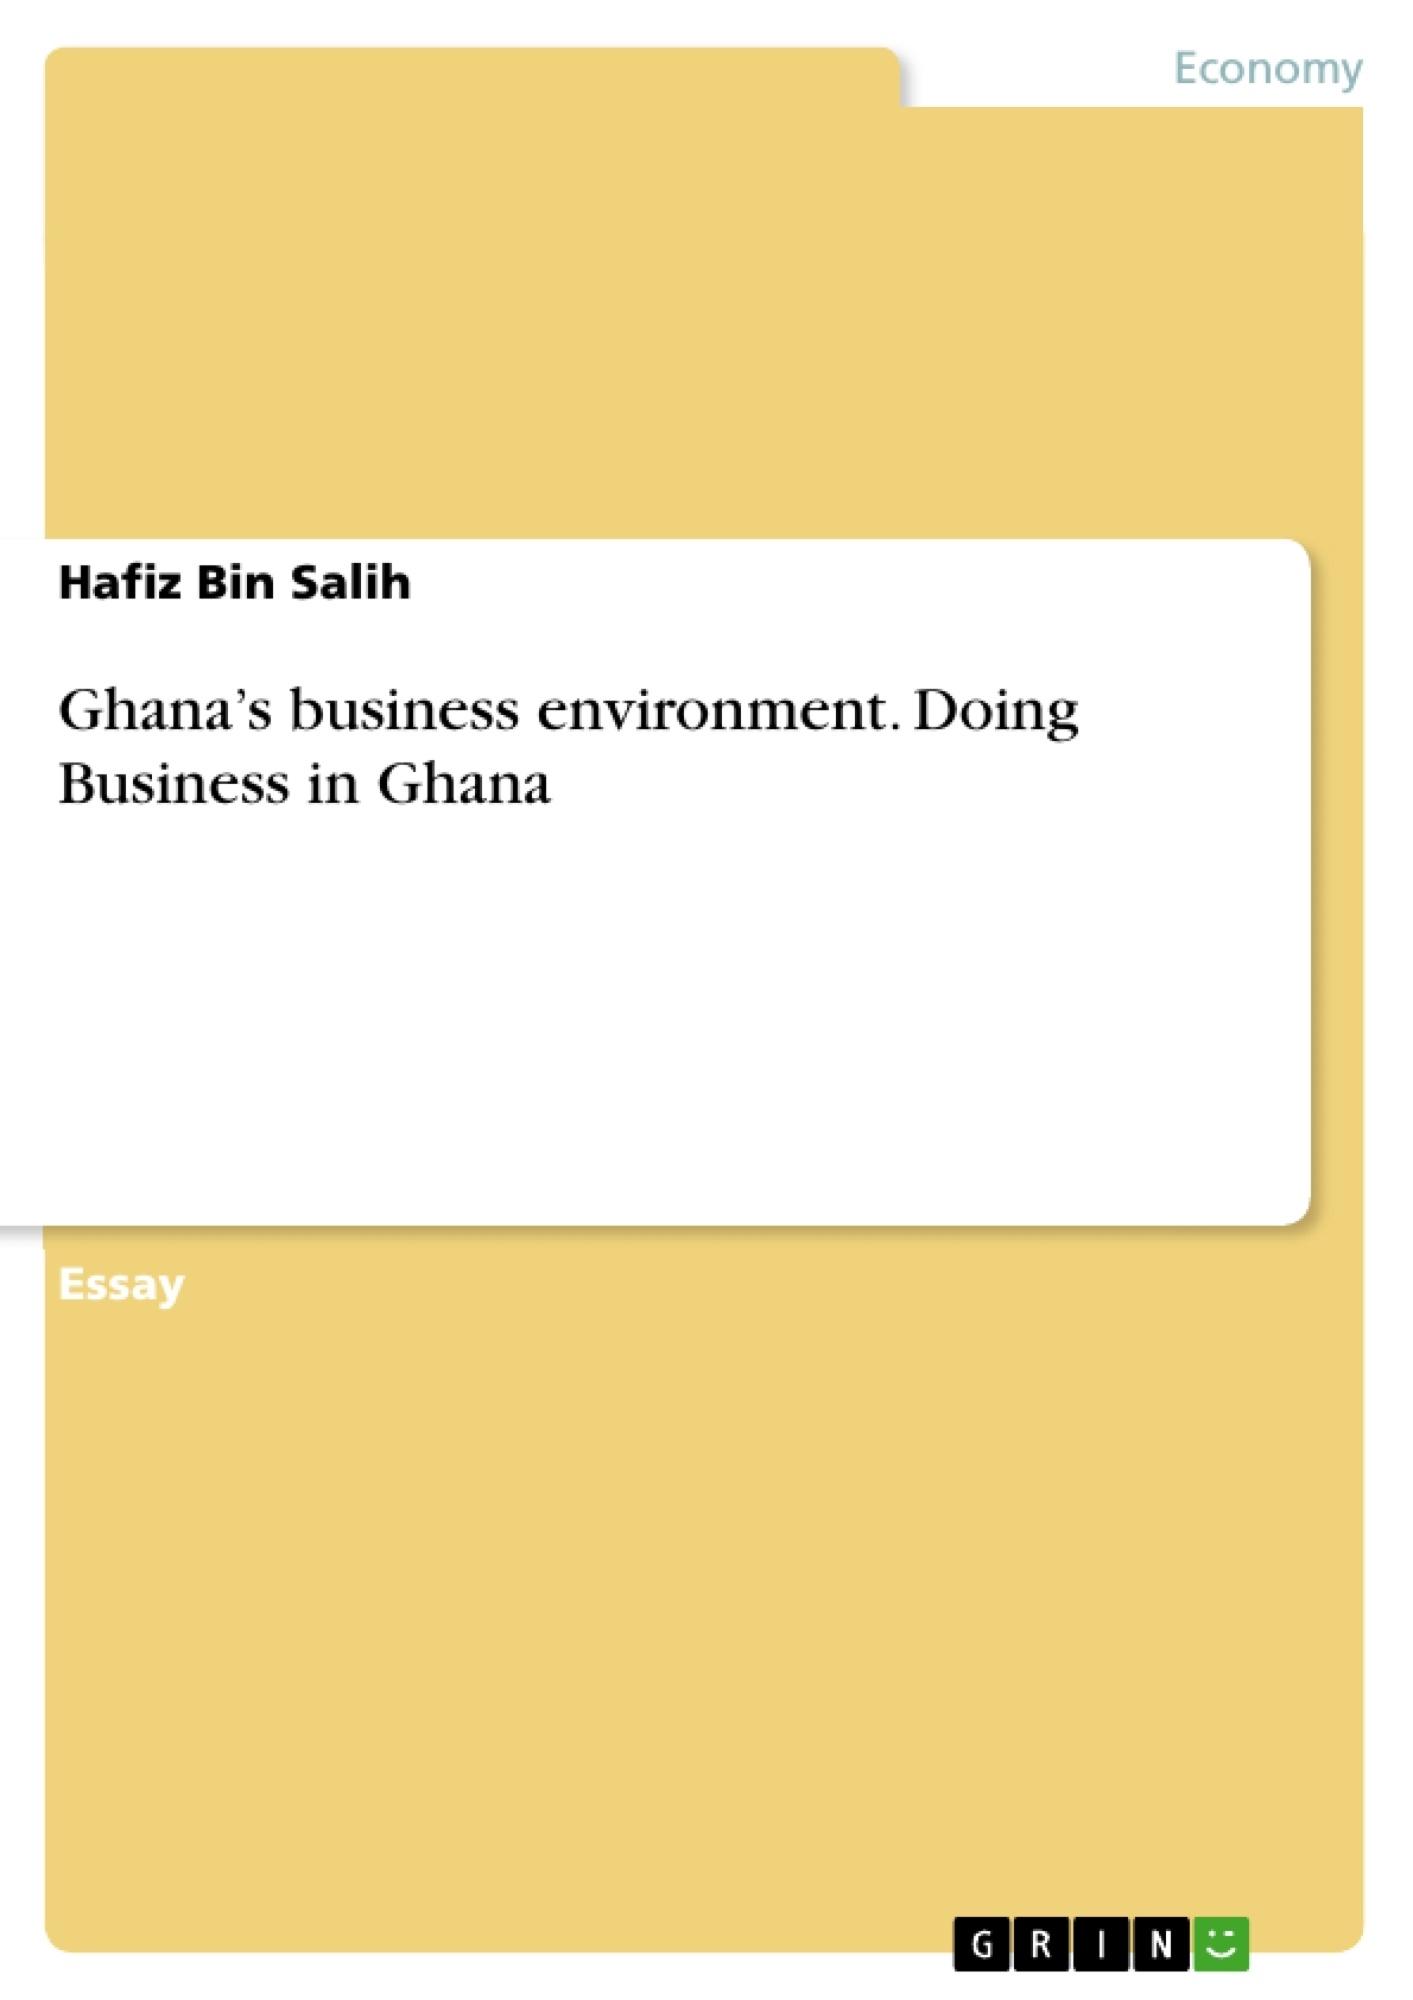 Title: Ghana's business environment. Doing Business in Ghana